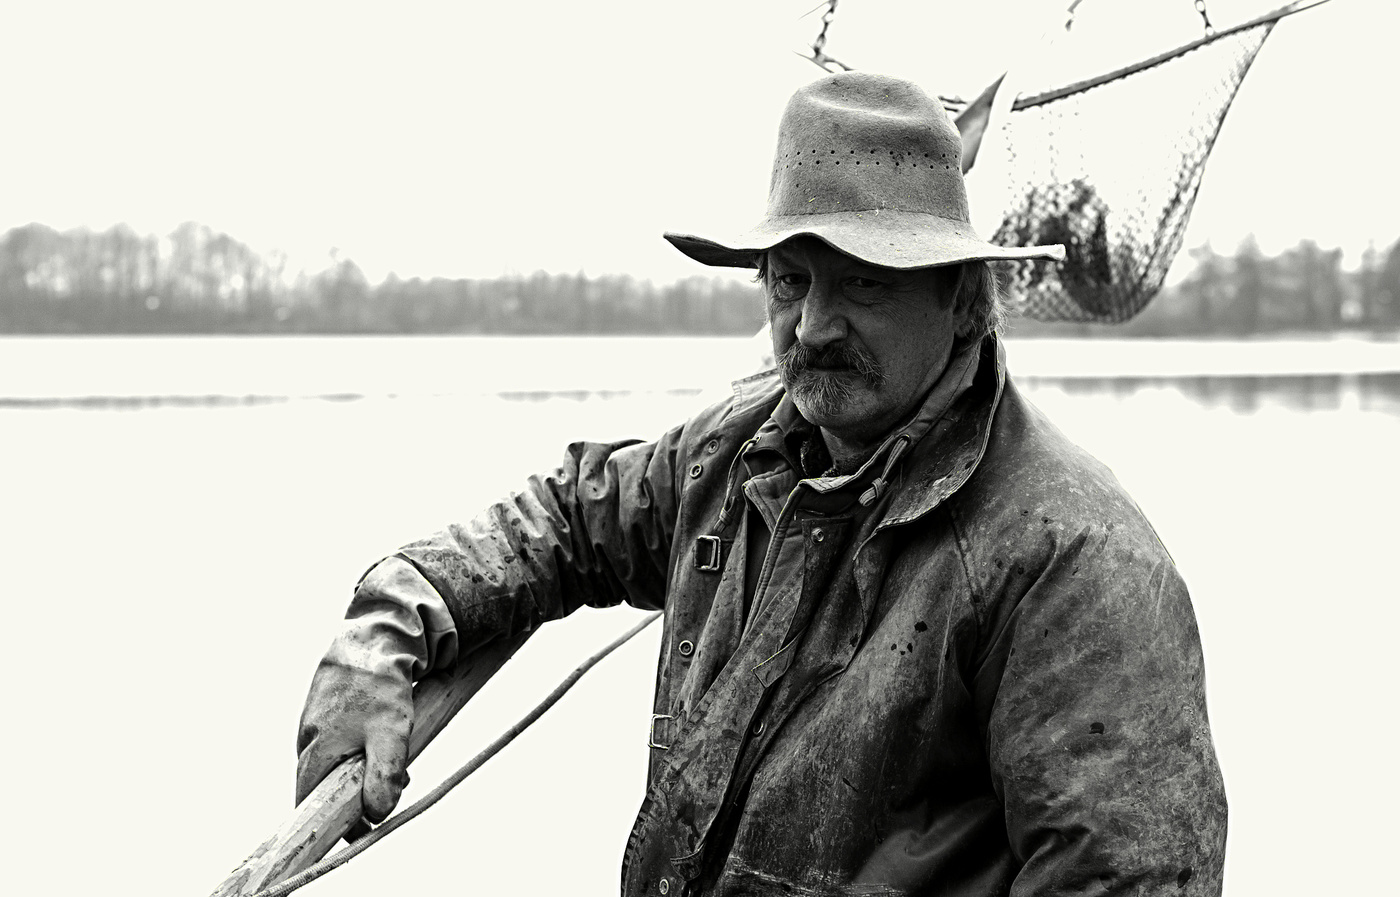 Portrét rybáře.